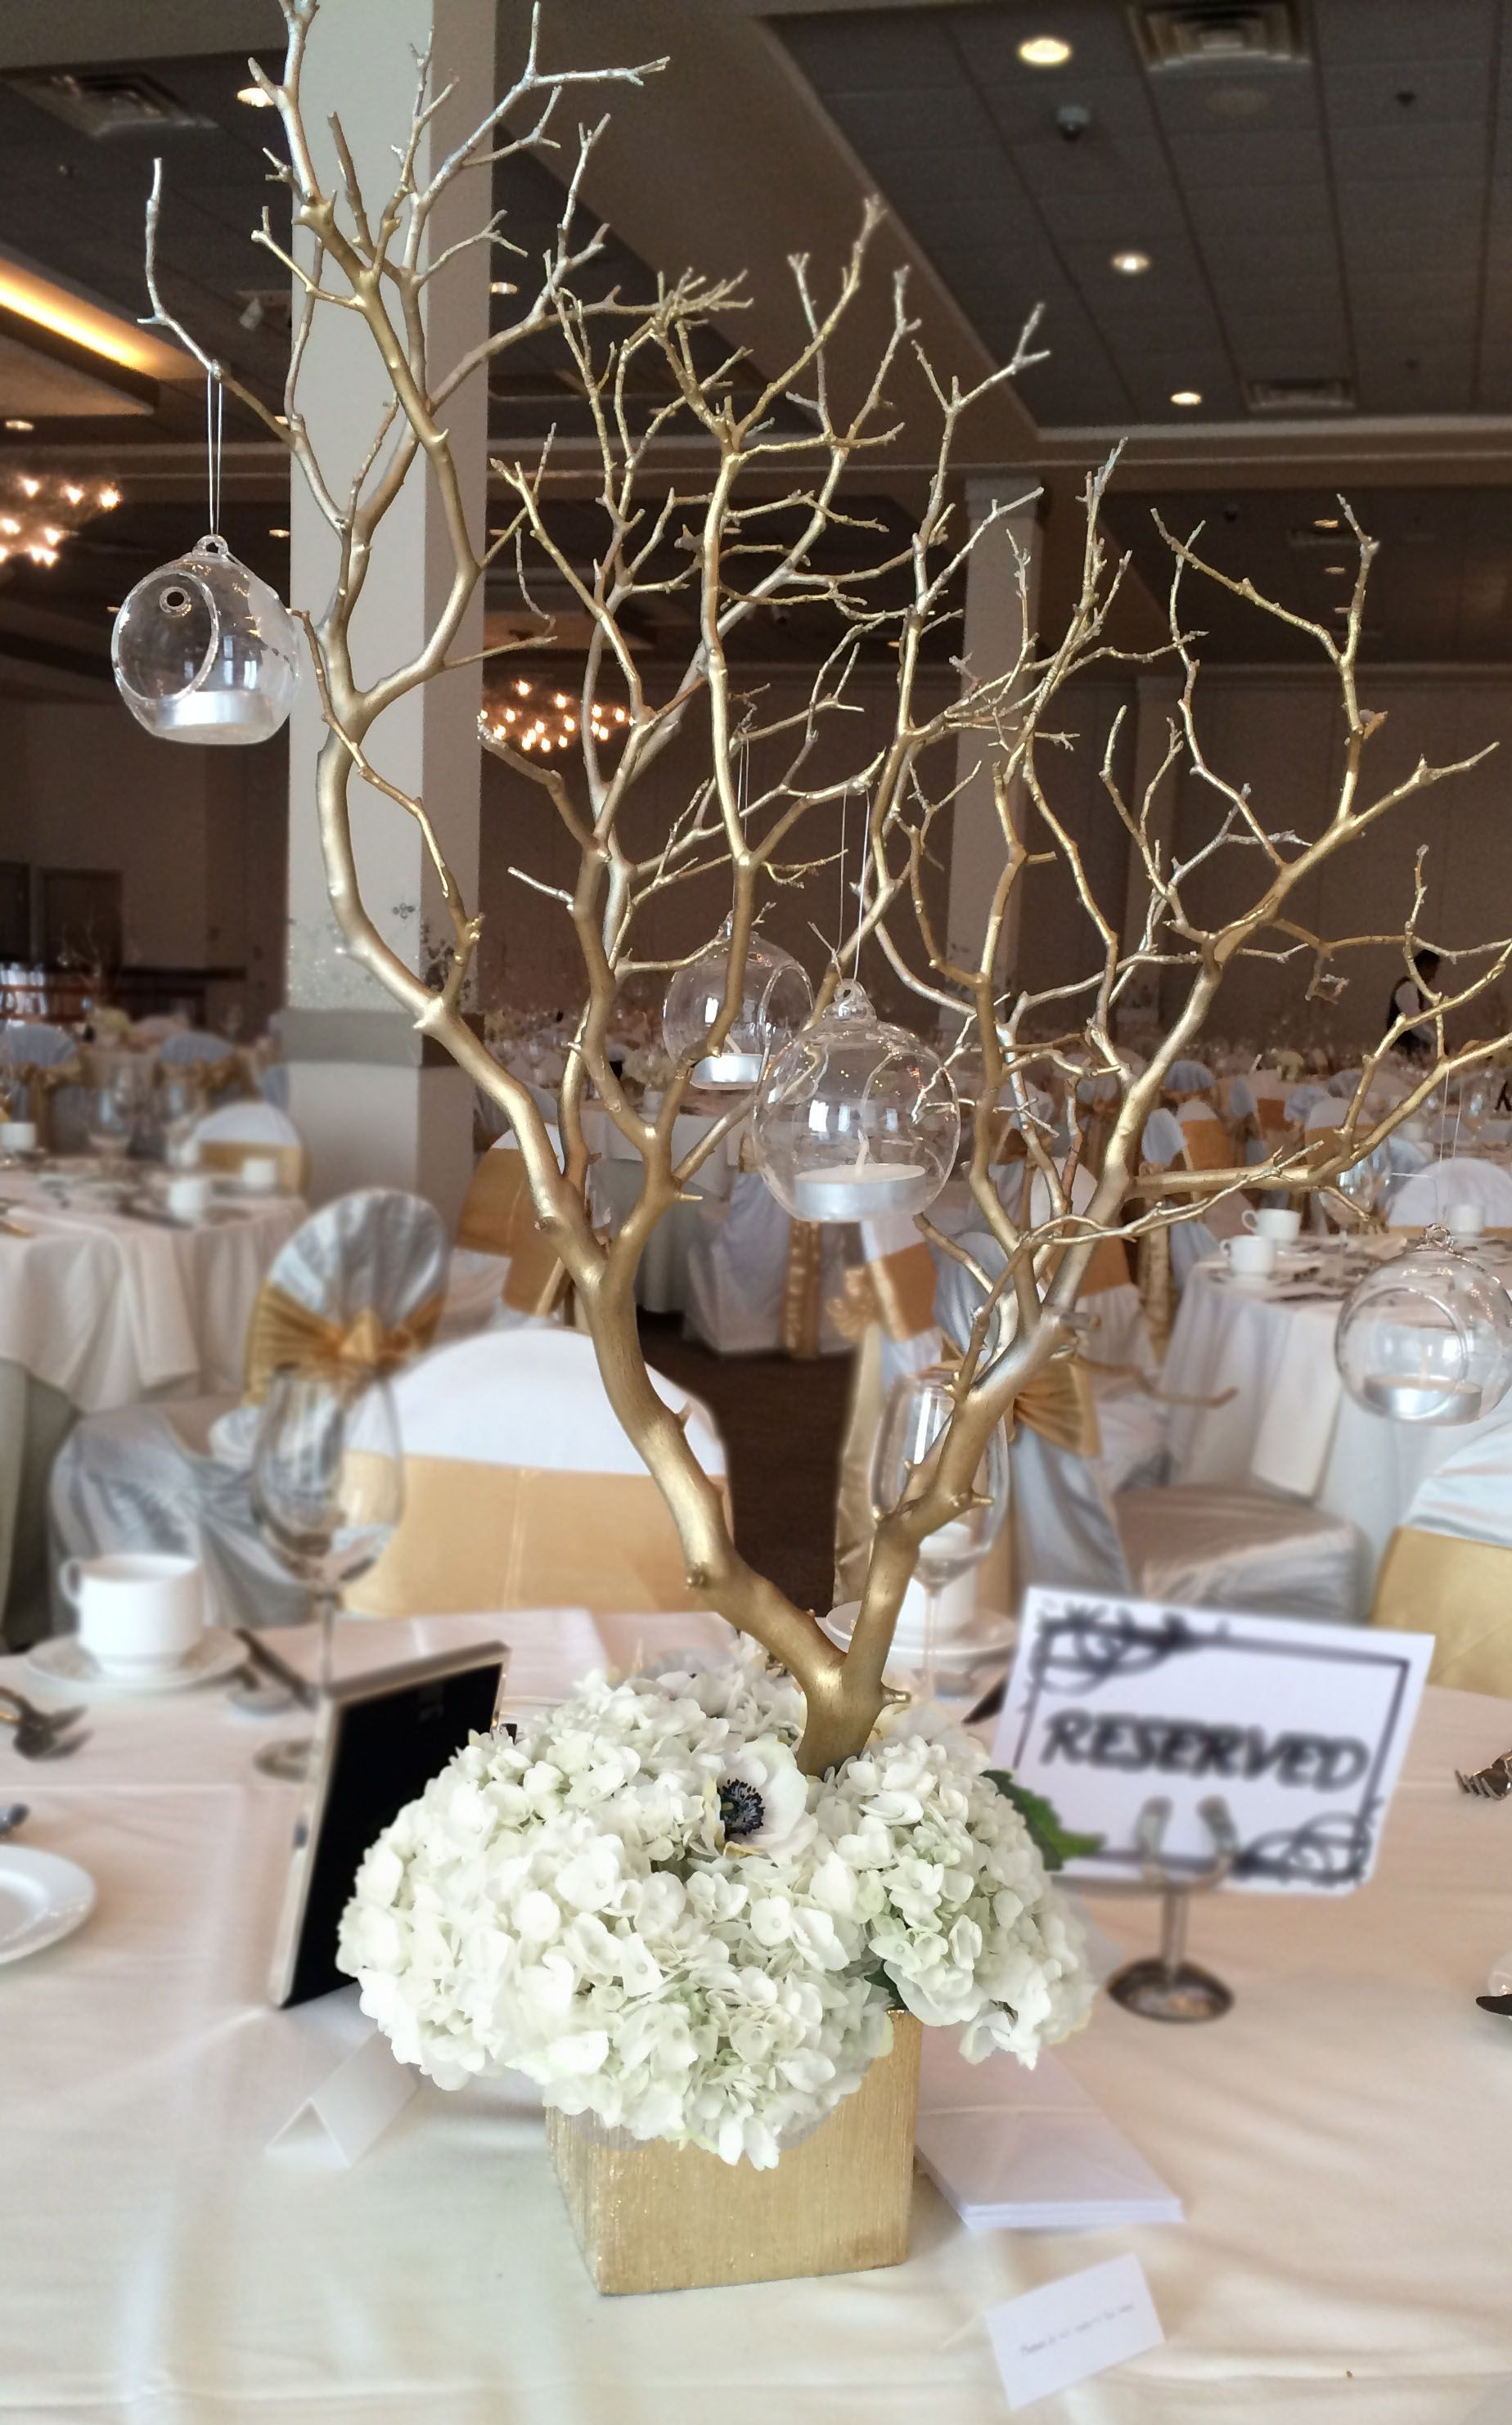 Reception centerpieces arrangement includes gold sprayed